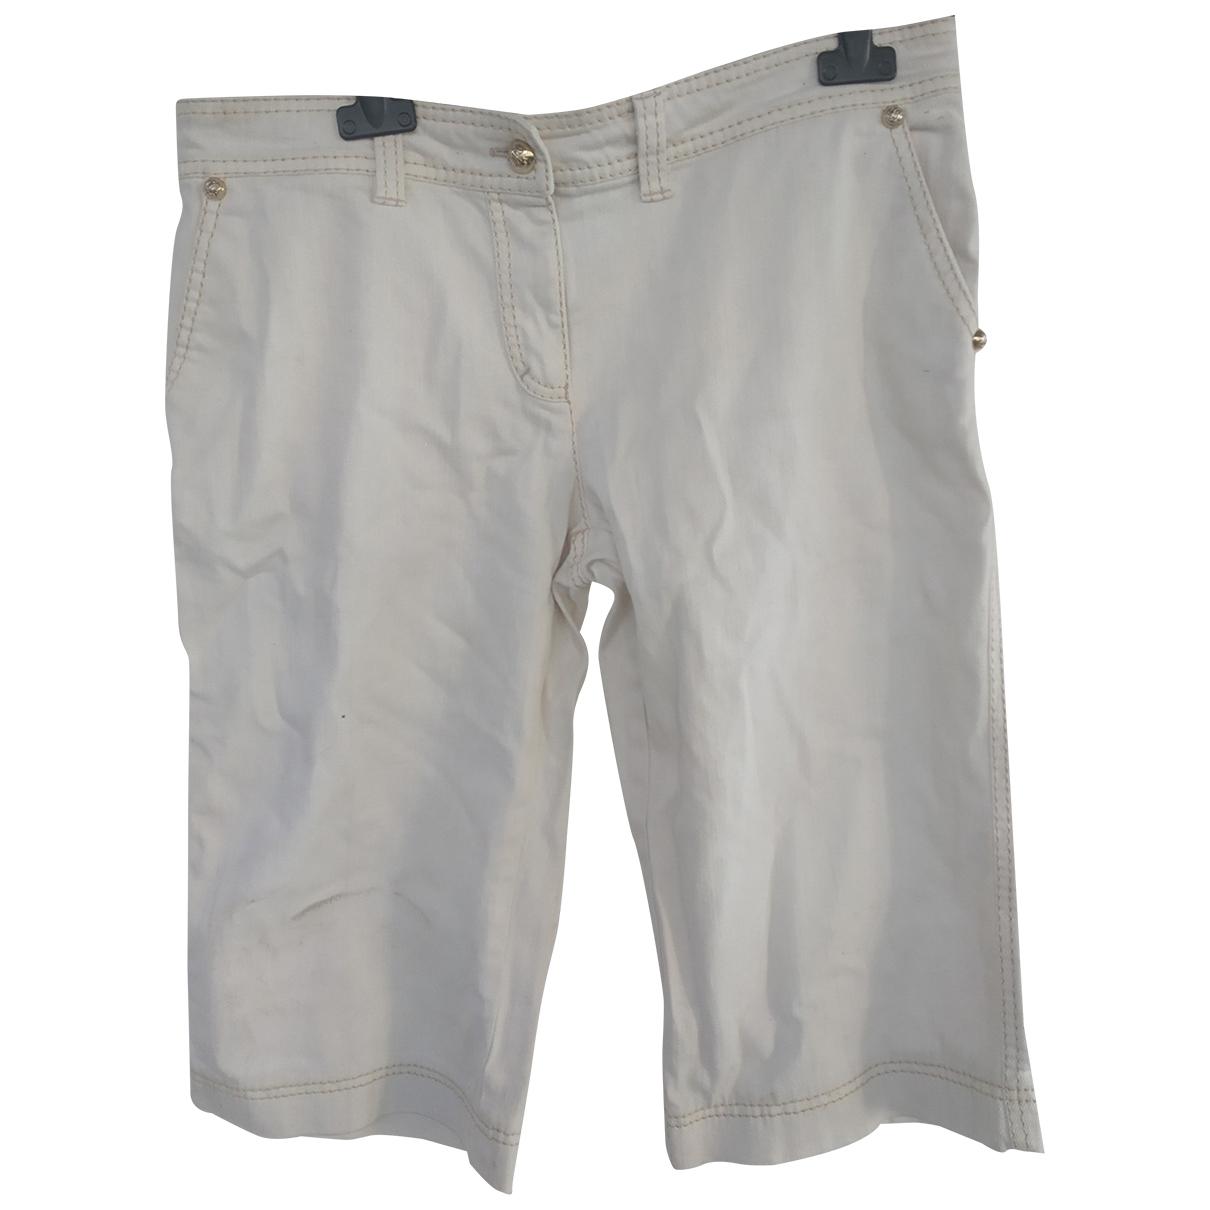 Roberto Cavalli \N White Denim - Jeans Shorts for Women 44 IT